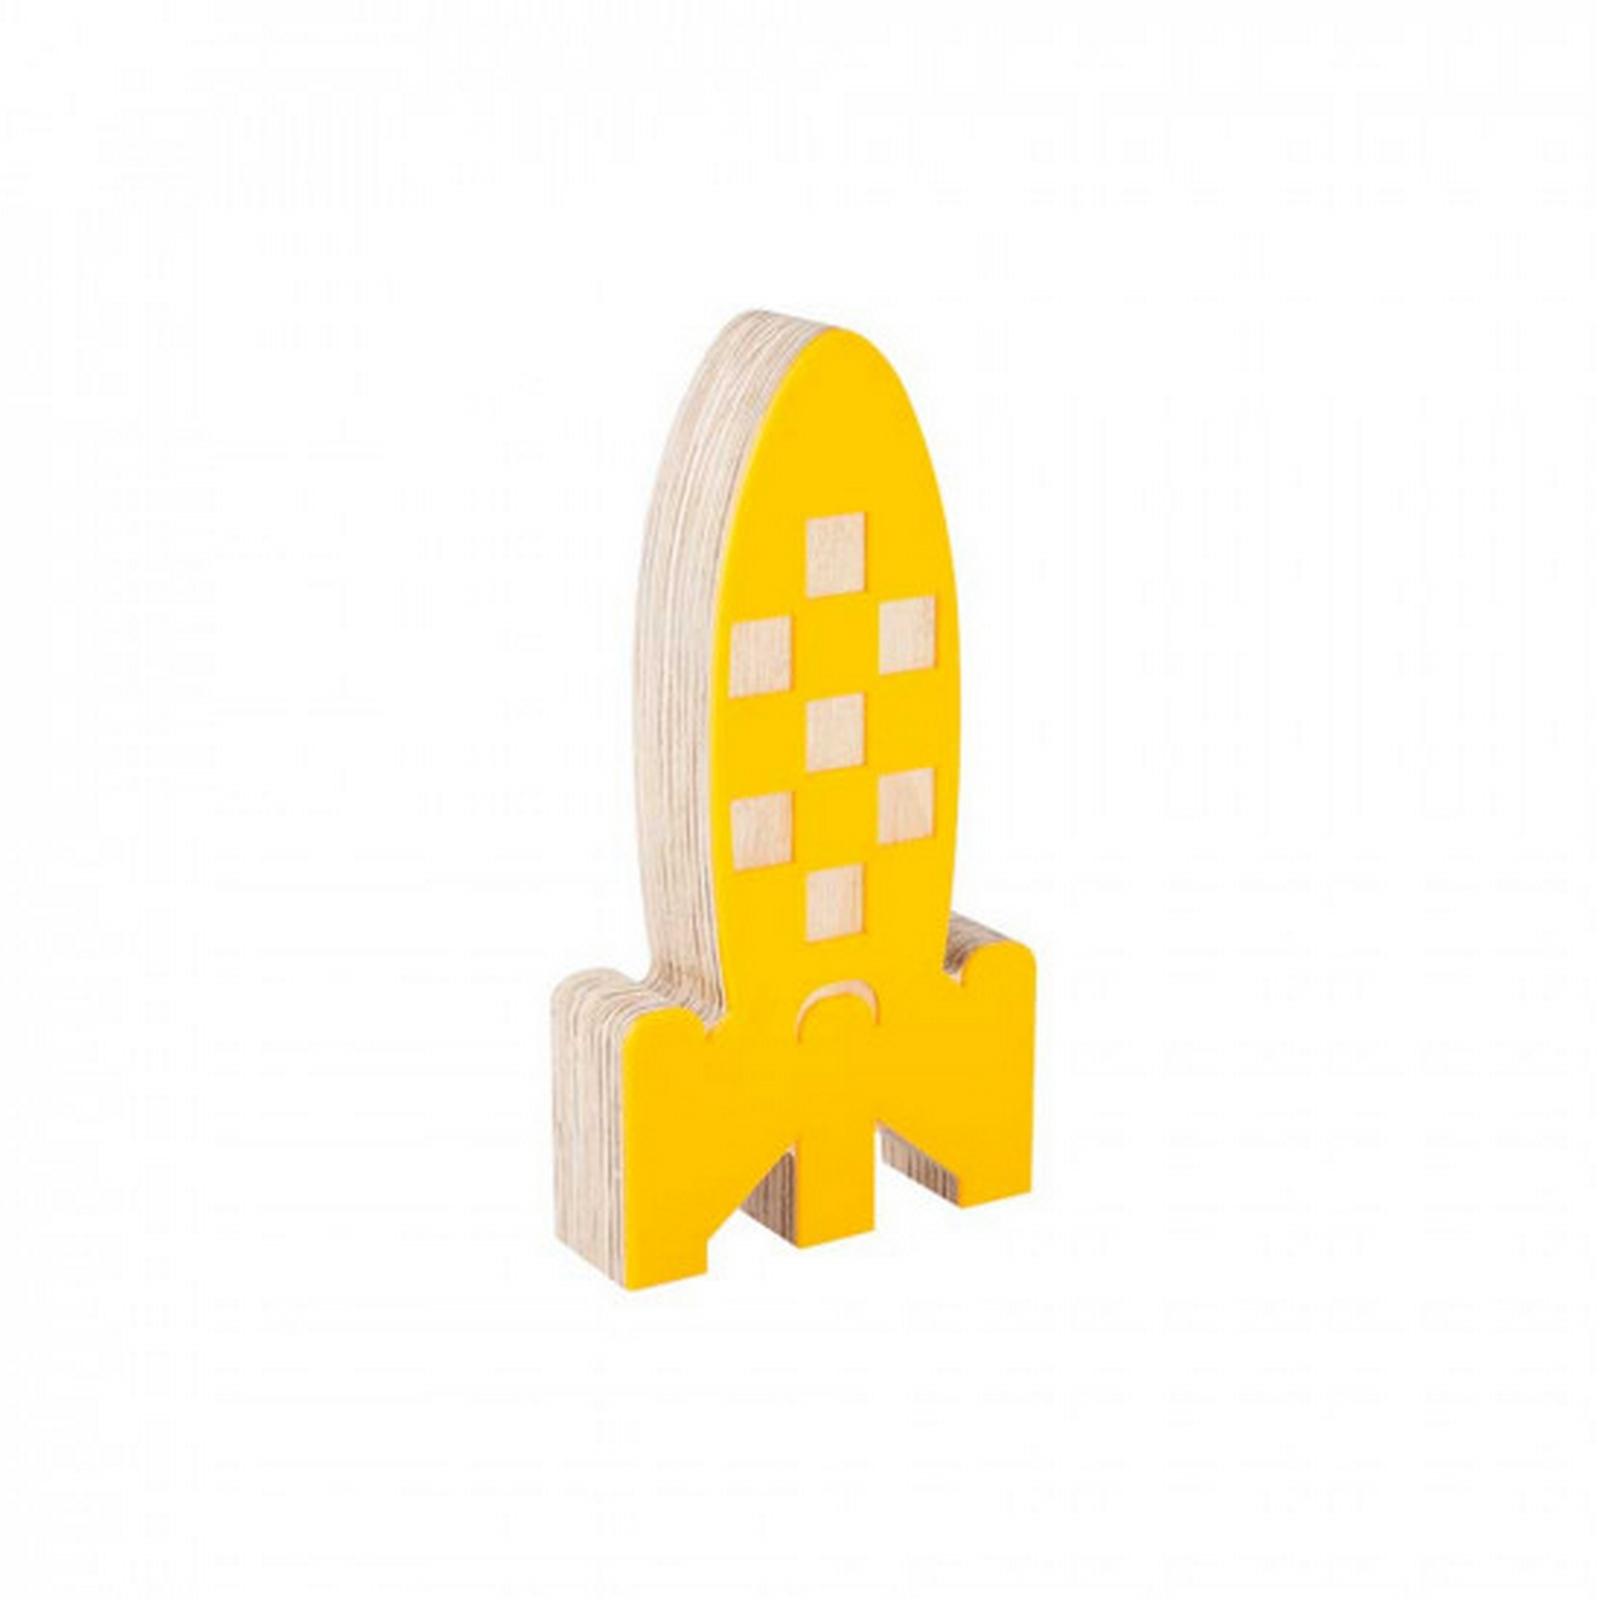 Foguete de Acrílico Amarelo